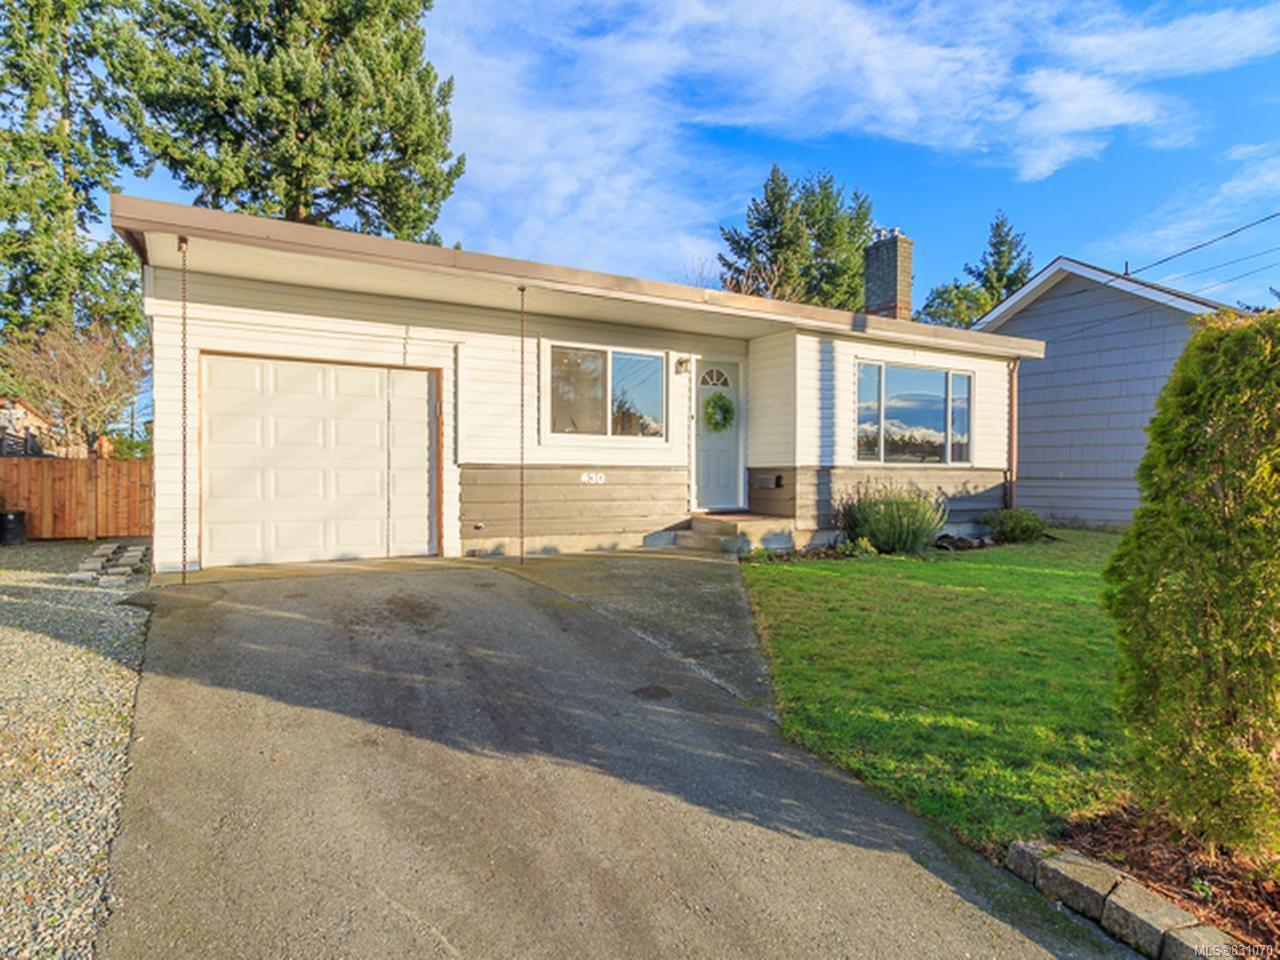 Main Photo: 430 JUNIPER STREET in NANAIMO: Na Brechin Hill House for sale (Nanaimo)  : MLS®# 831070